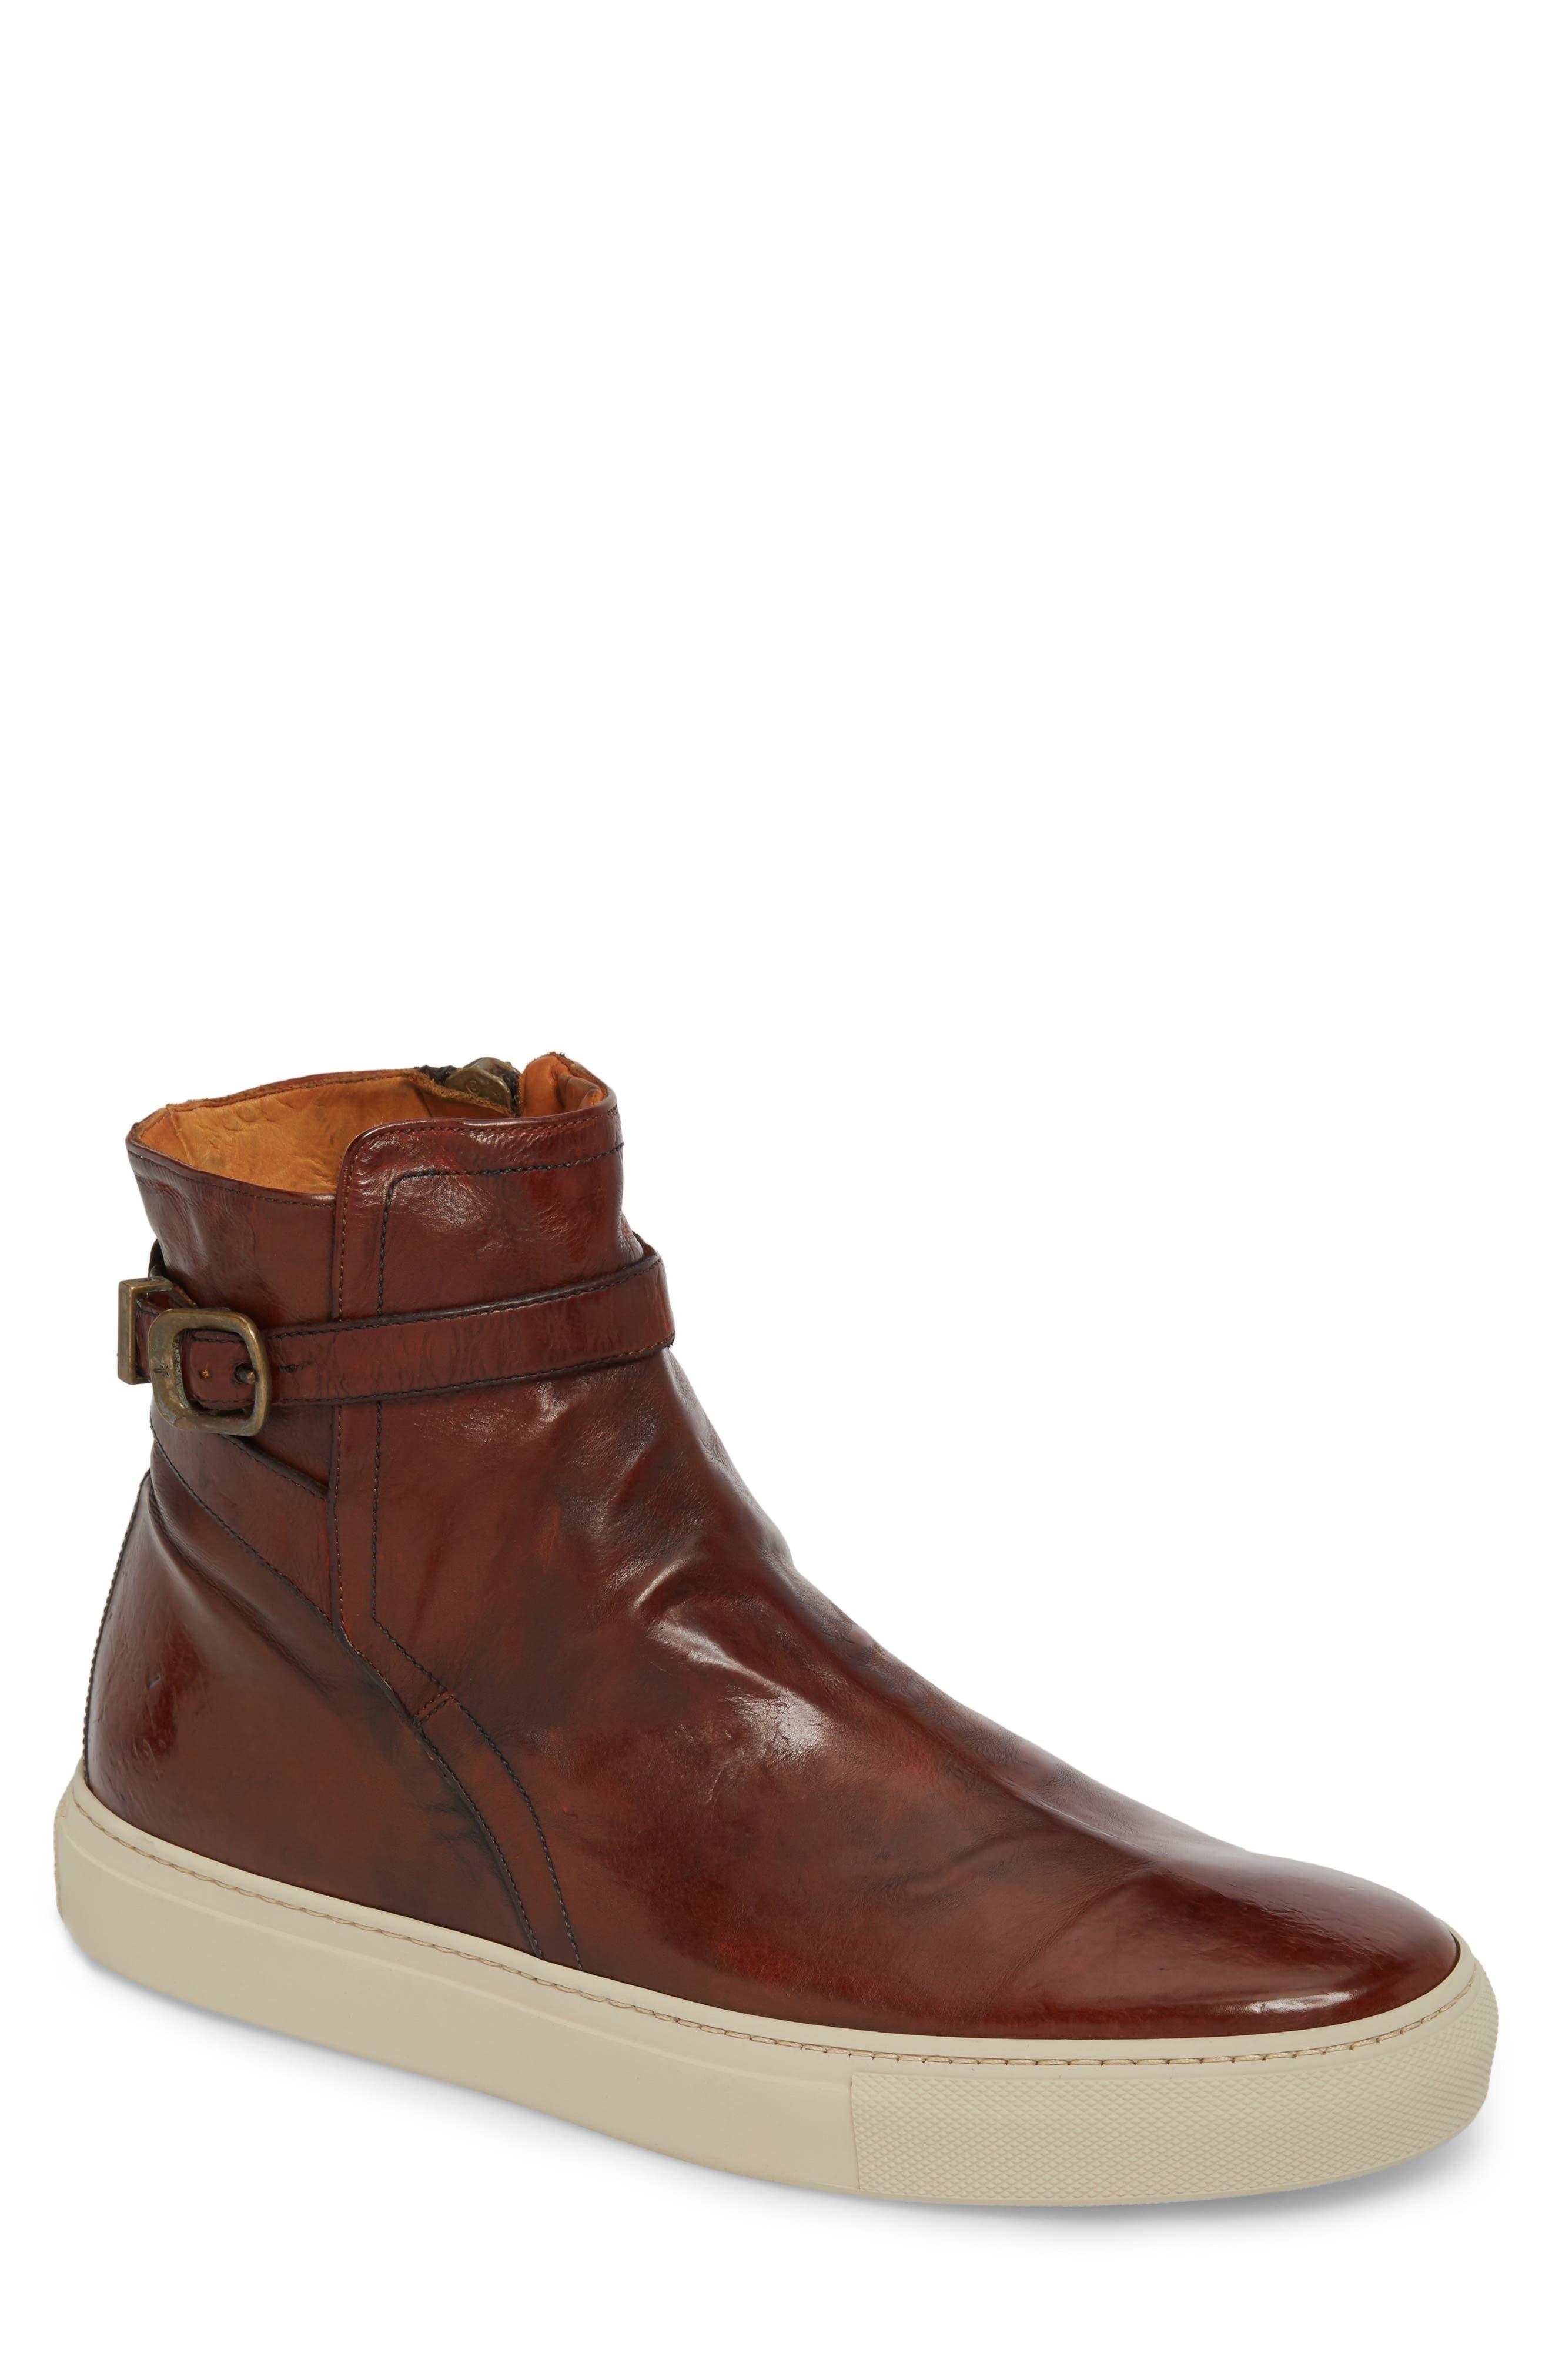 Owen Jodhpur High Top Sneaker,                             Main thumbnail 1, color,                             Redwood Leather